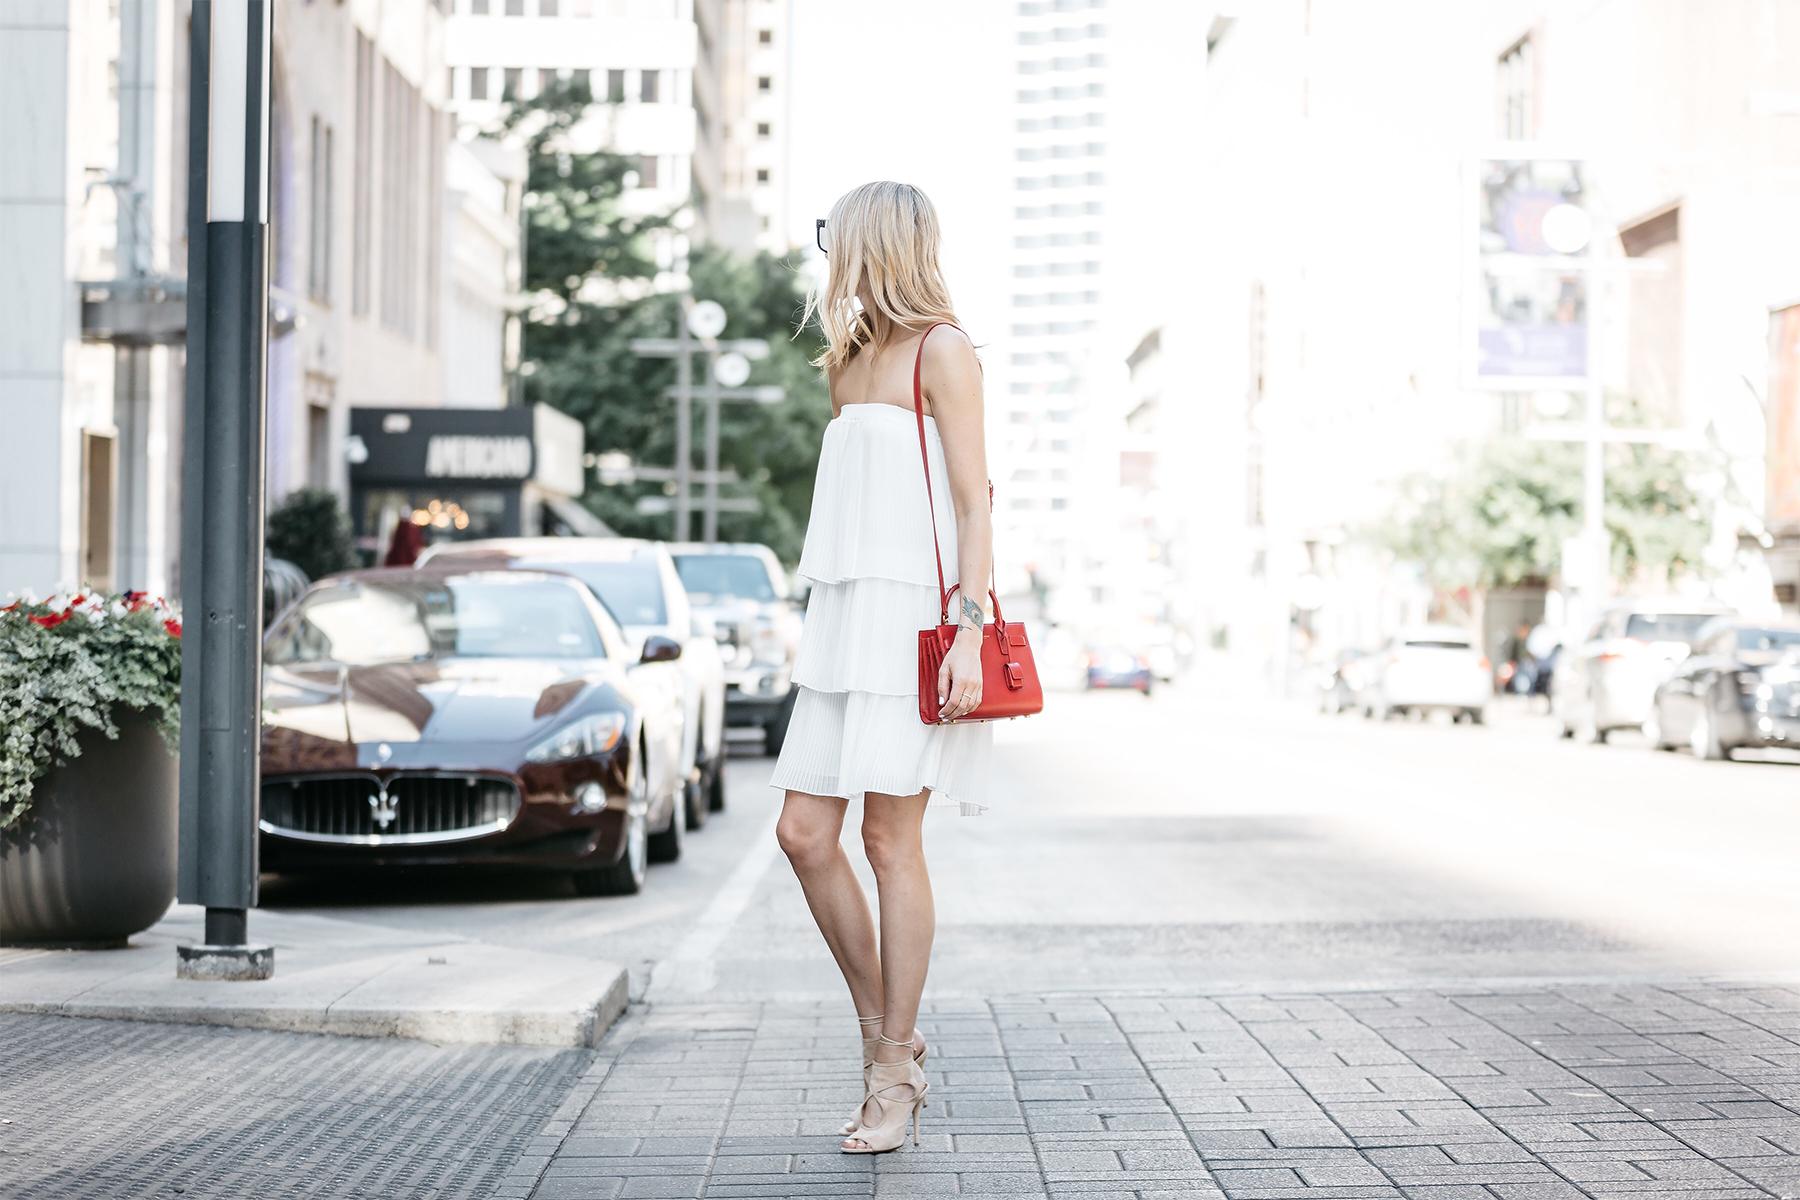 Fashion Jackson, Dallas Blogger, Fashion Blogger, Street Style, Little White Dress, Nordstrom White Pleated Strapless Dress, YSL Nano Sac De Jour Red Handbag, Aquazzura Nude Sexy Thang Heels, Black Celine Sunglasses